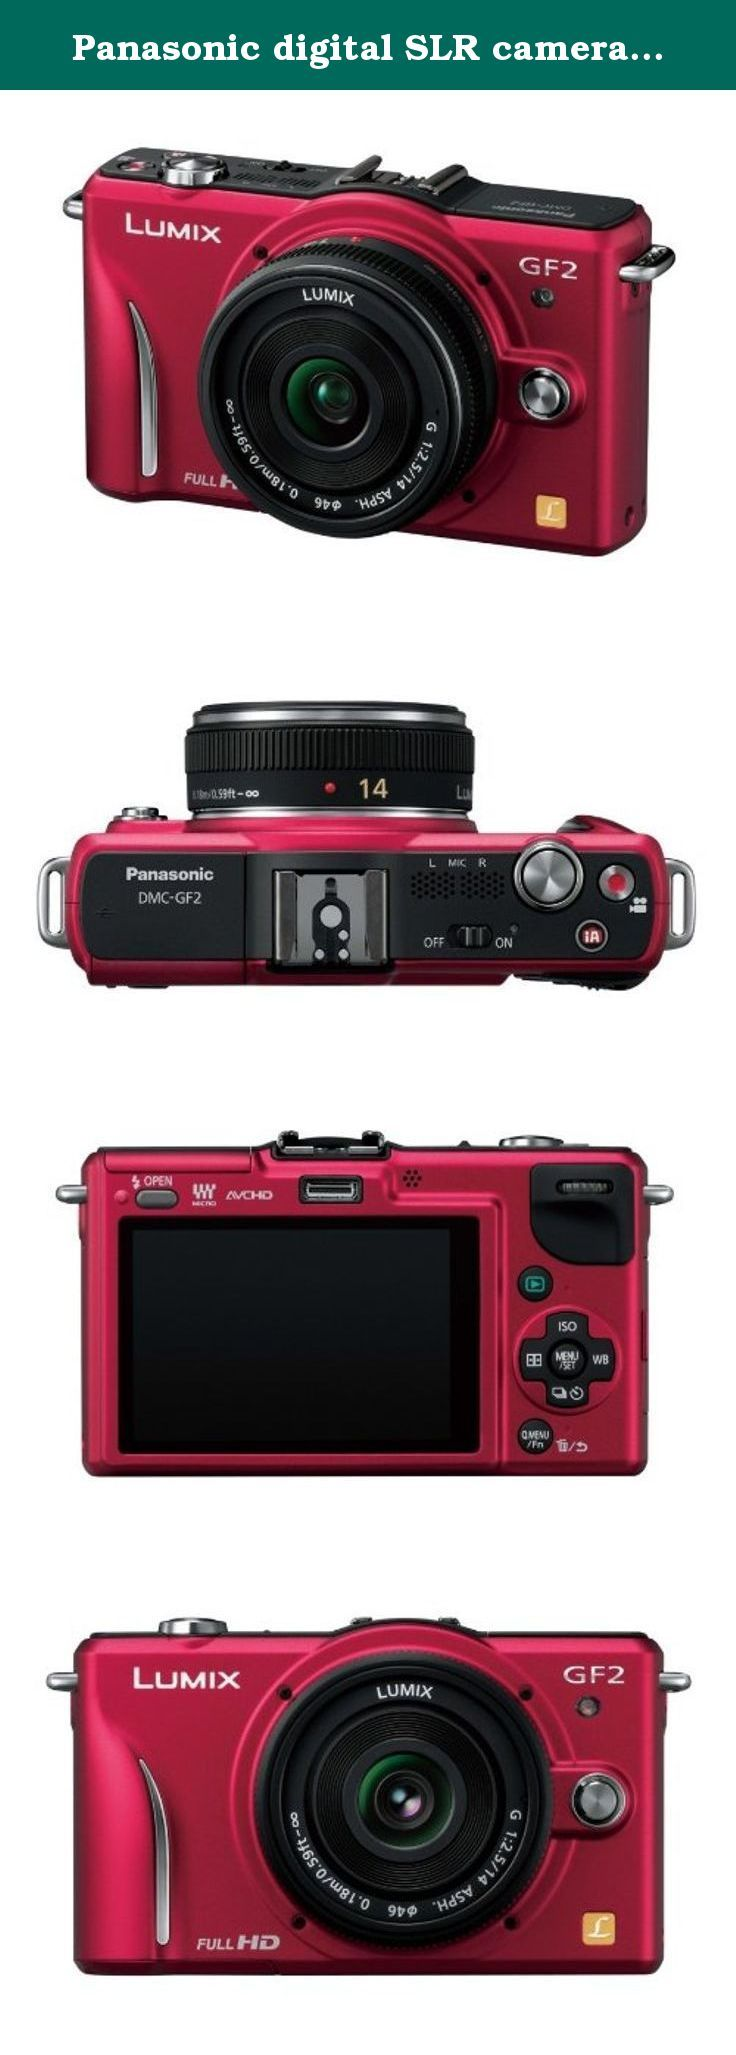 Panasonic digital SLR camera GF2 kit lens (14mm / F2.5 pancake lens included) full high-definition movie SLR Fine Red DMC-GF2 CR. Japanese Menu Only.